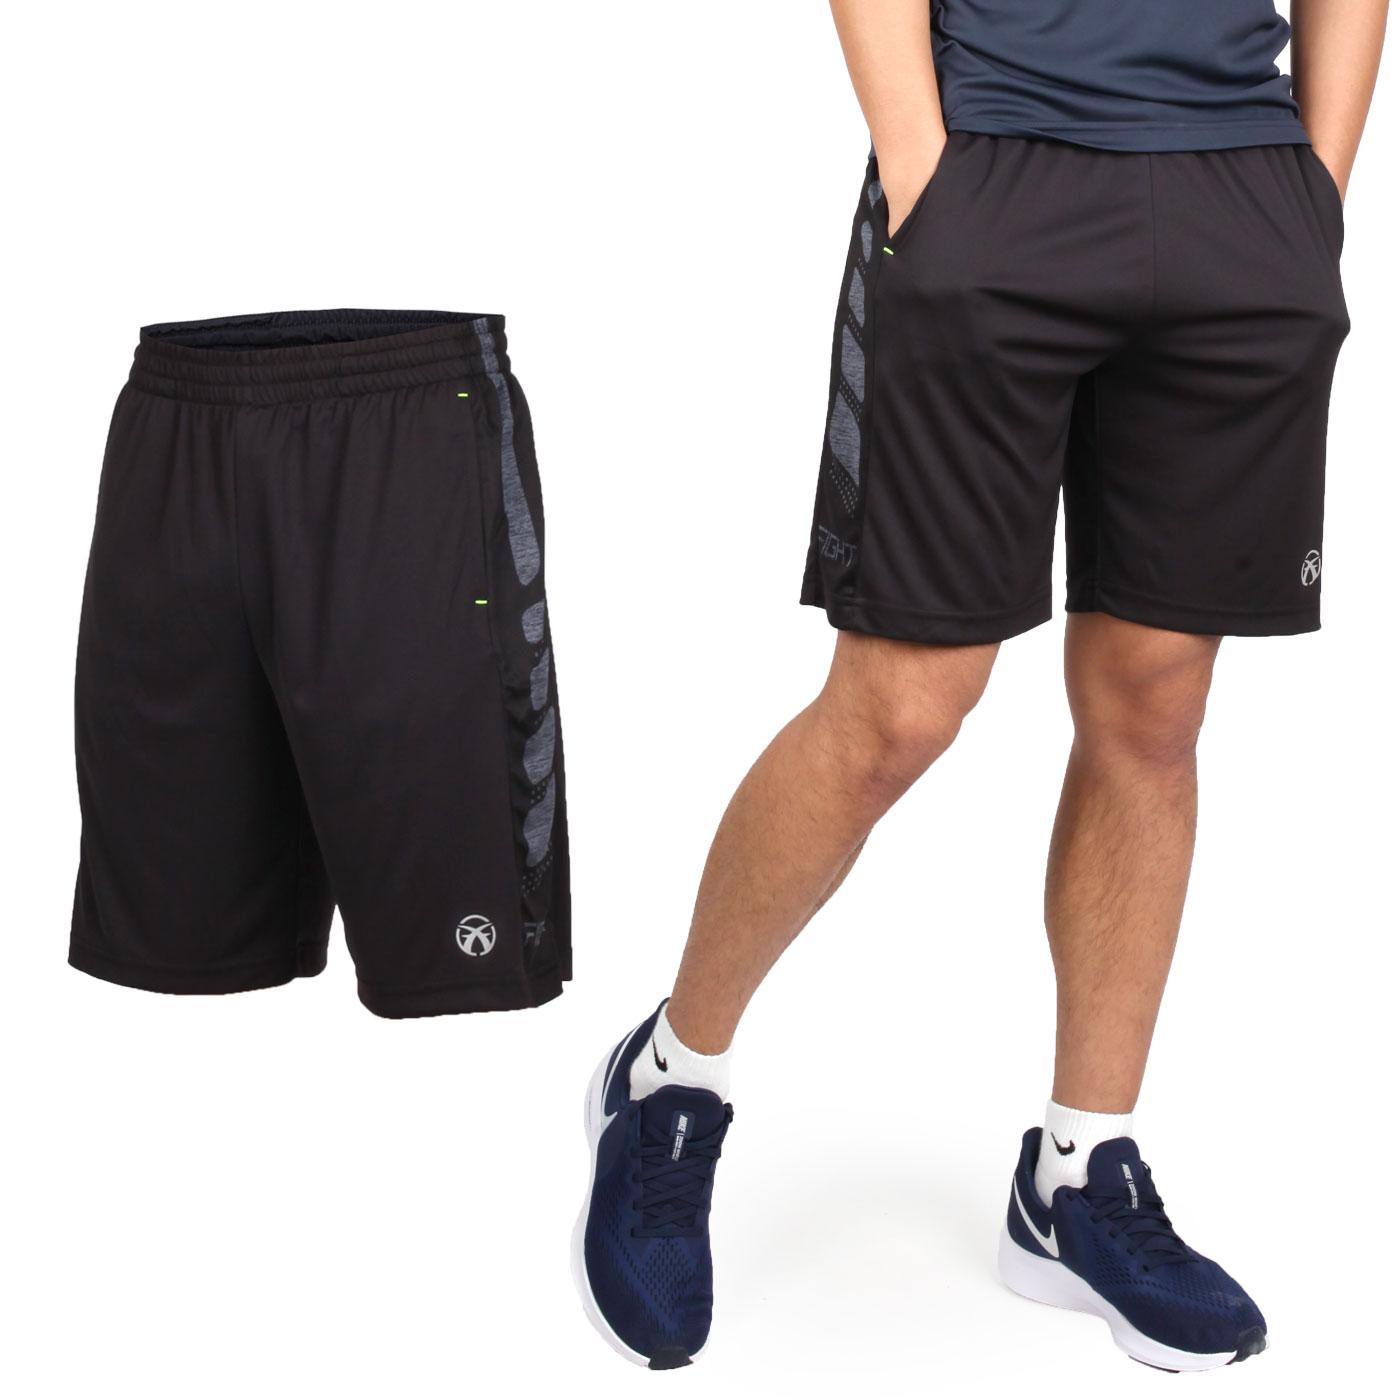 FIRESTAR 男款吸濕排汗籃球短褲 B9201-18 - 黑灰